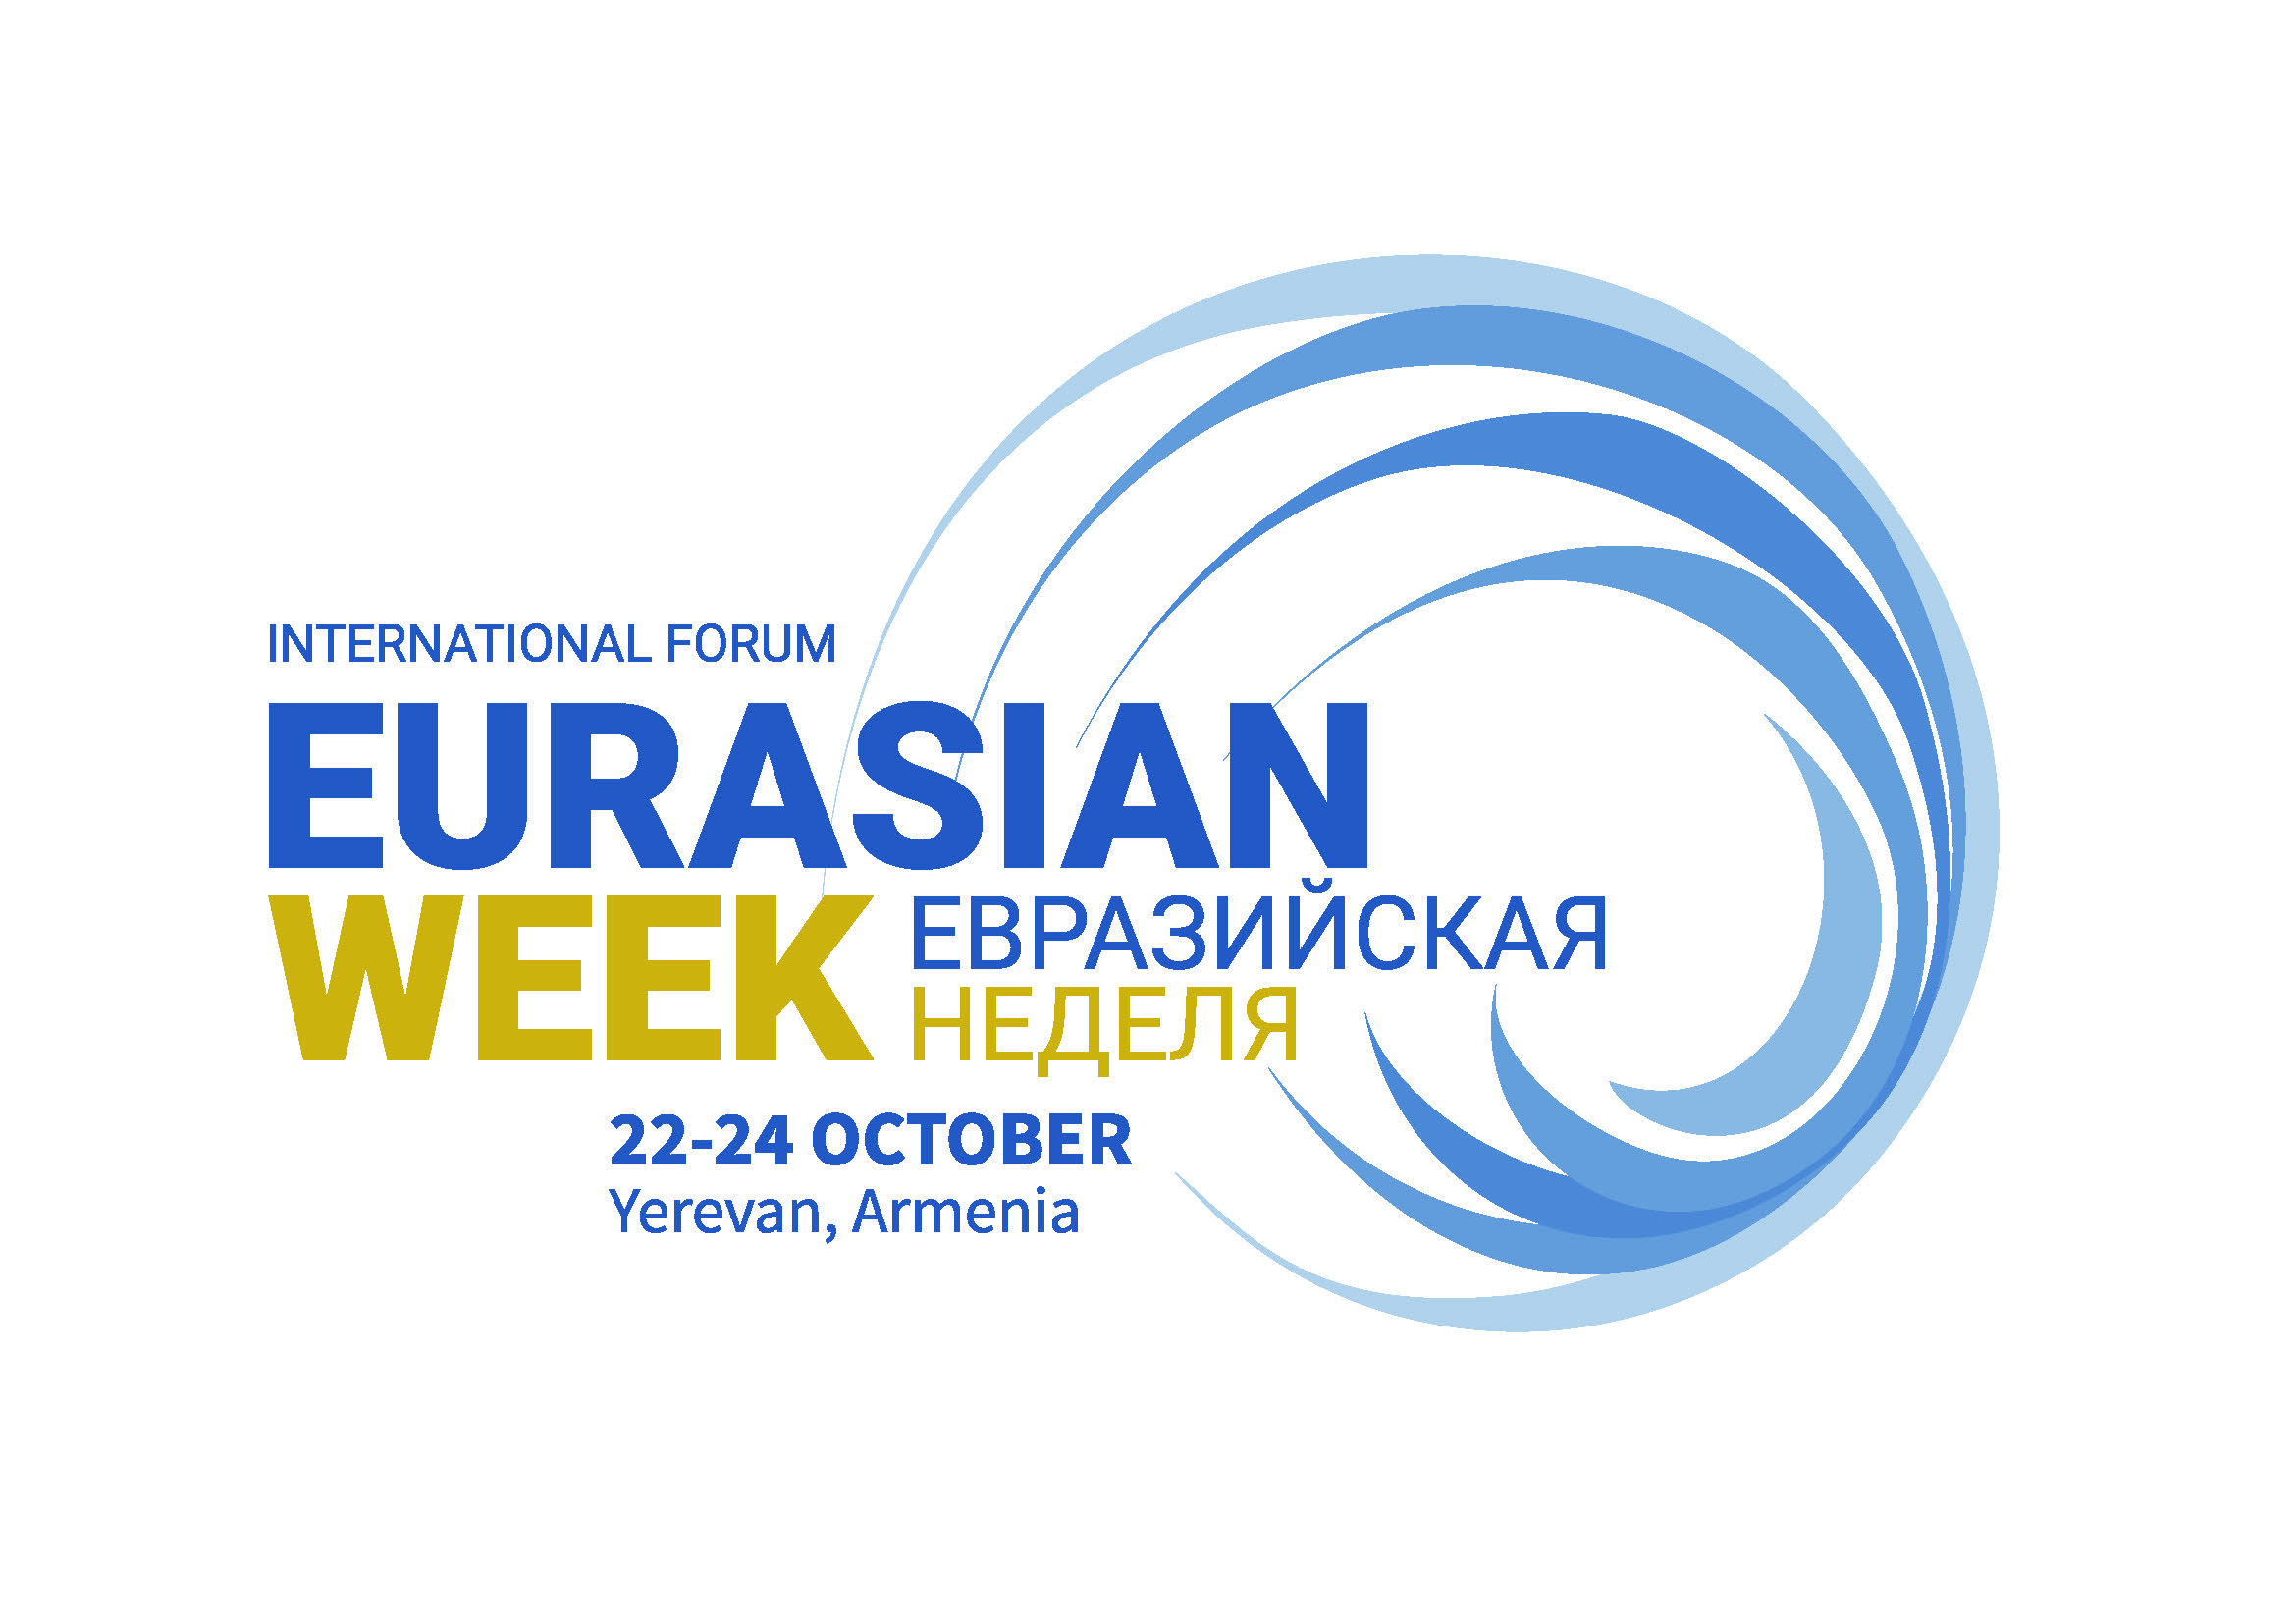 http://omsk.tpprf.ru/upload/iblock/ba0/ba0b52fe67ec30574efb5ac92aabdb9c.jpg